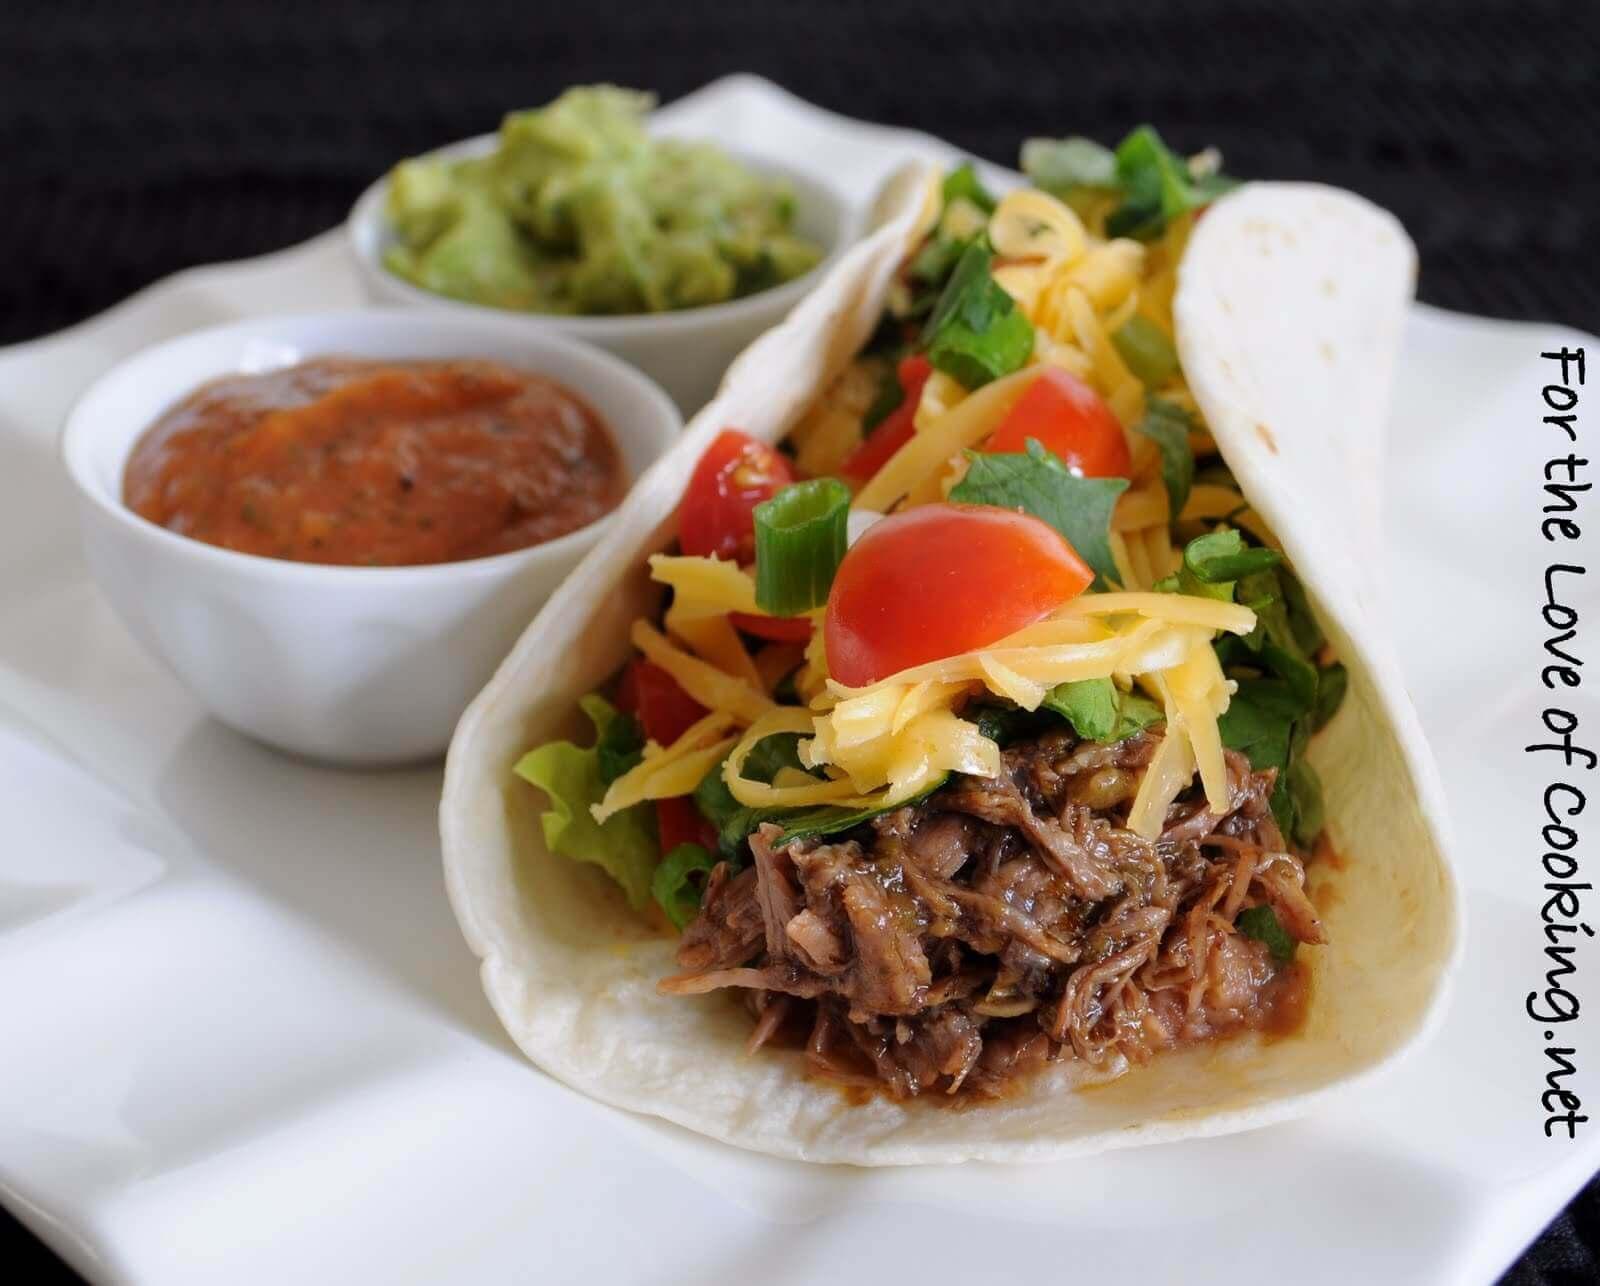 Shredded Beef Soft Tacos